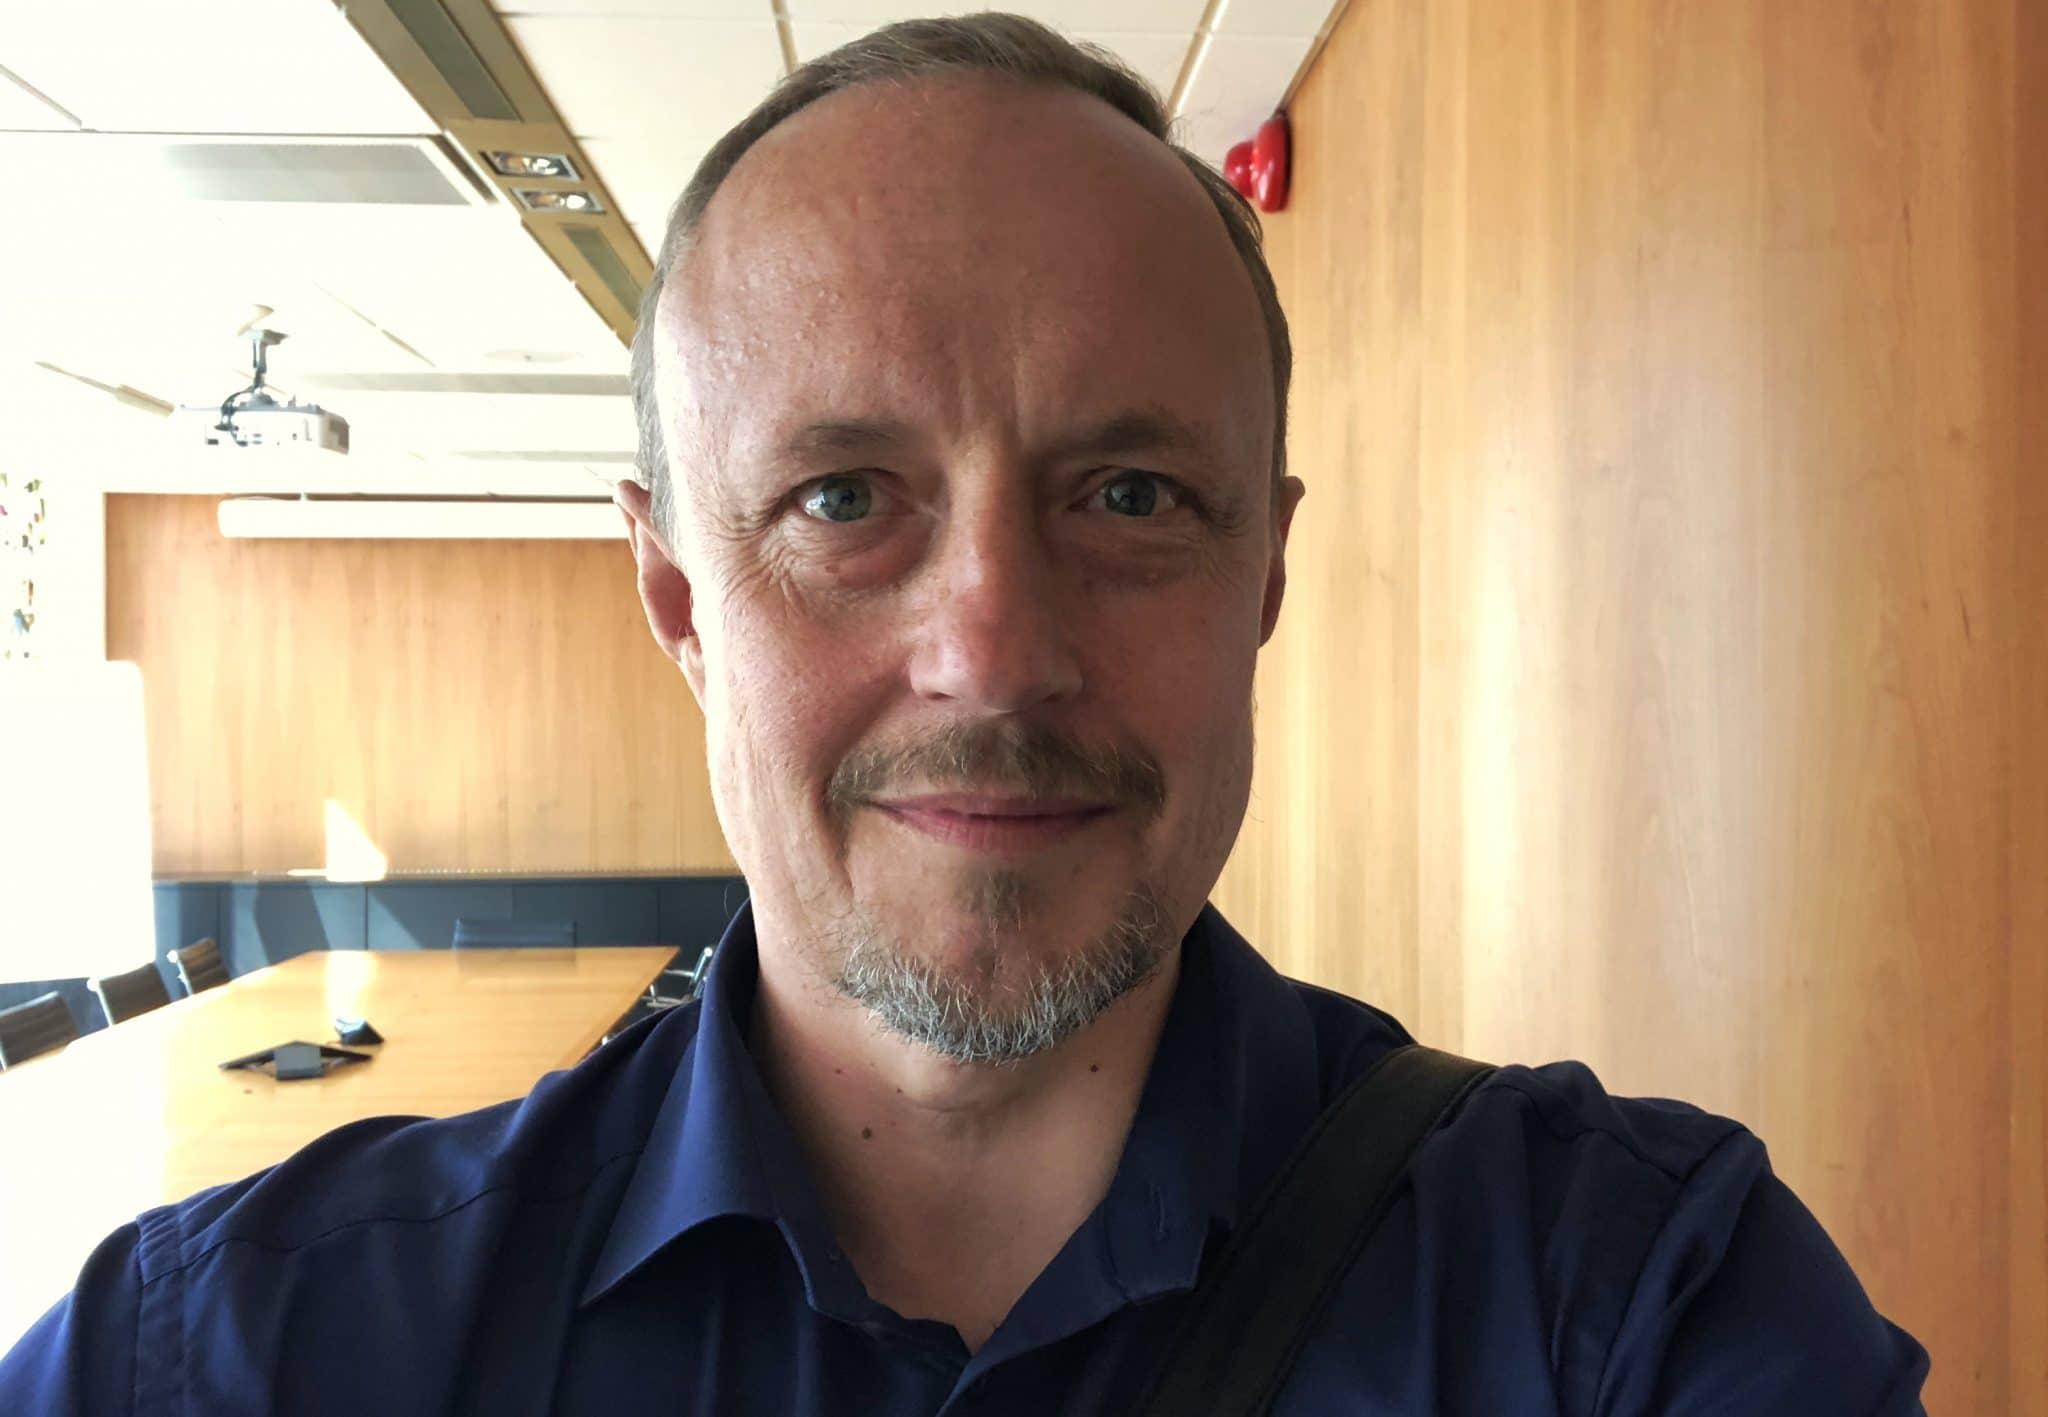 Jonas Florinus GuidesAndTemplates.com